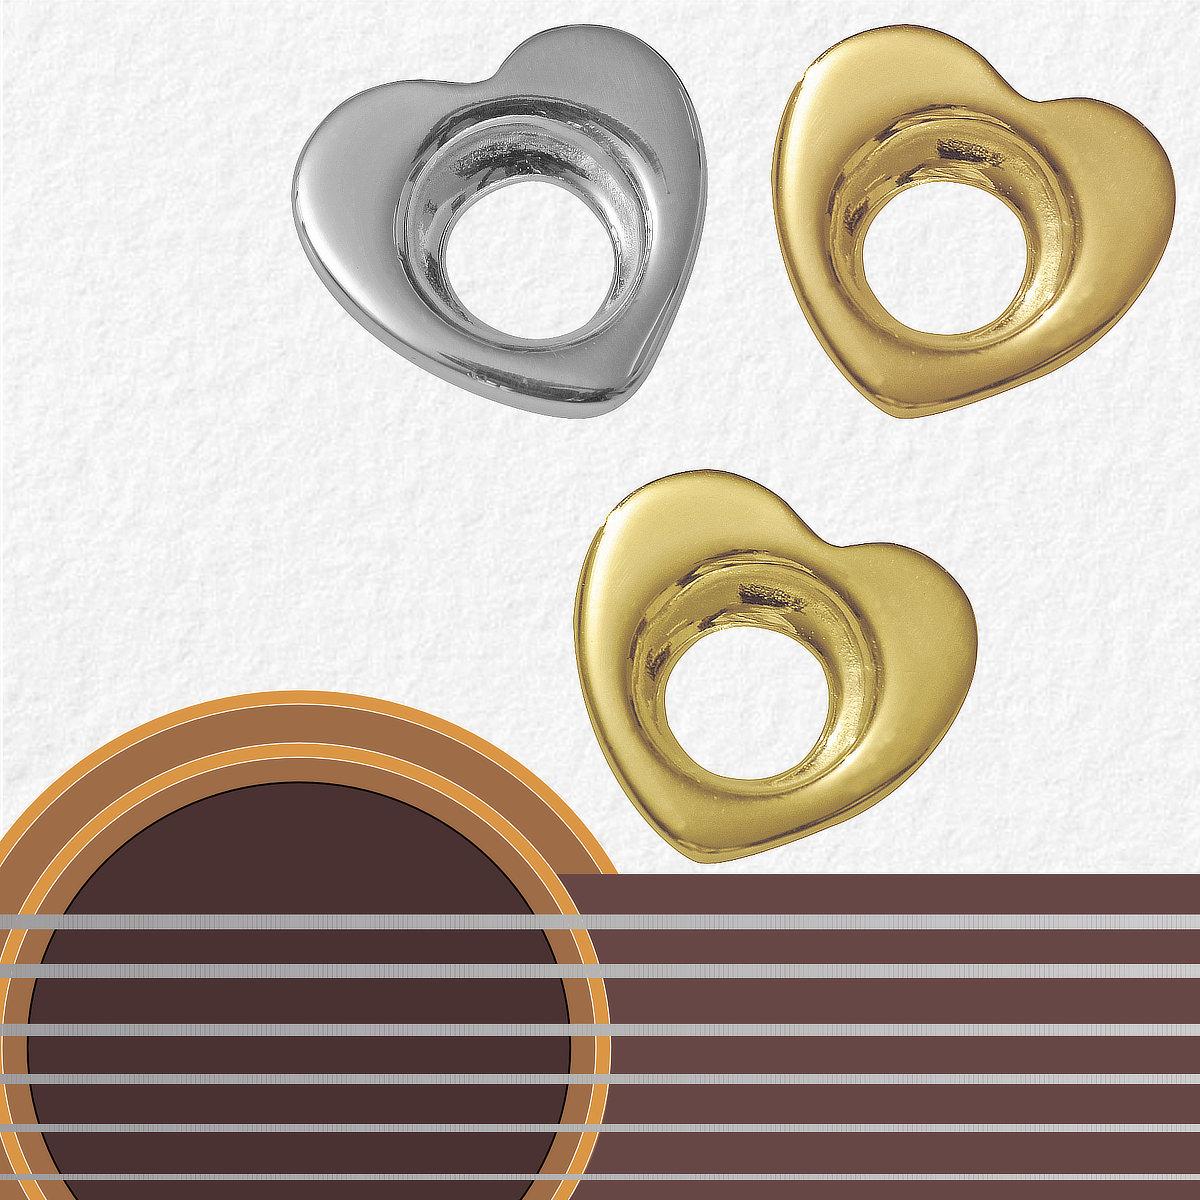 Médiators Blue Shark Big Heart Rhythm - Argent - Bronze - Laiton